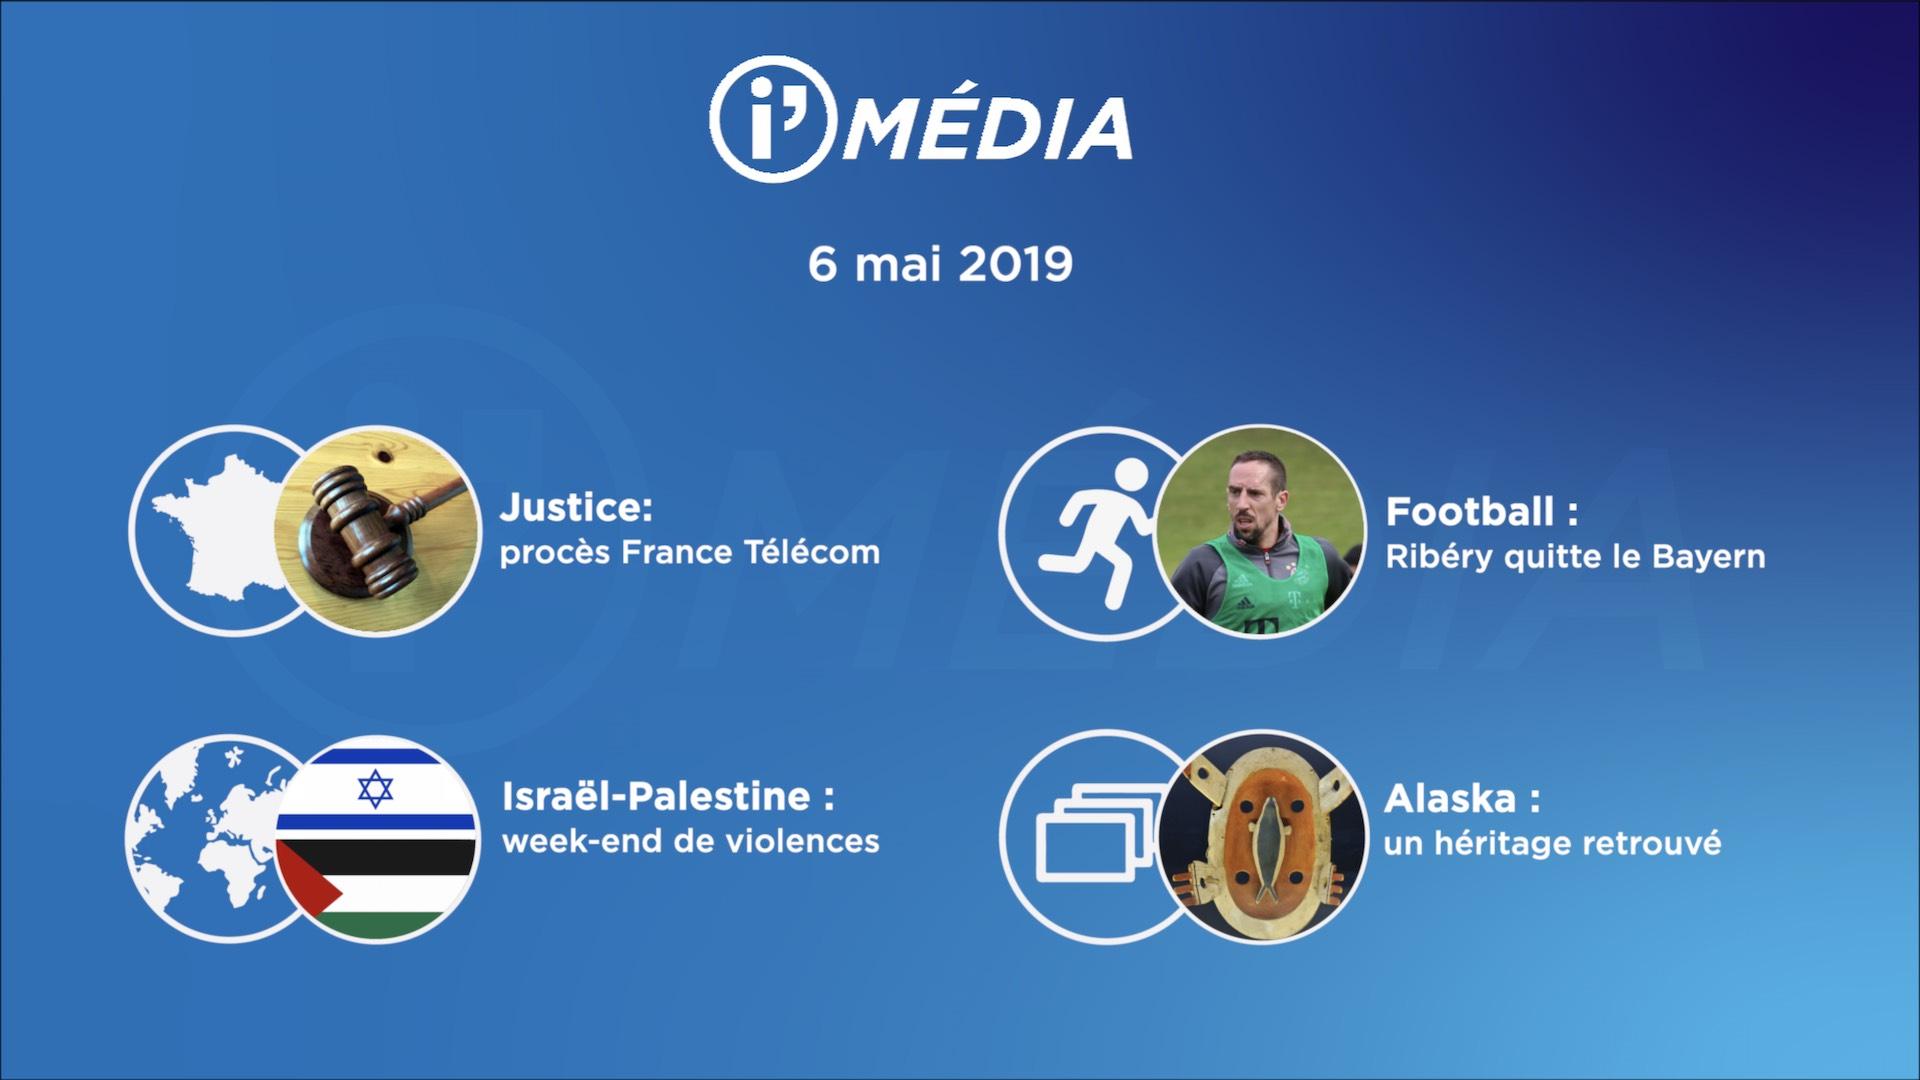 I'Média 6 mai 2019